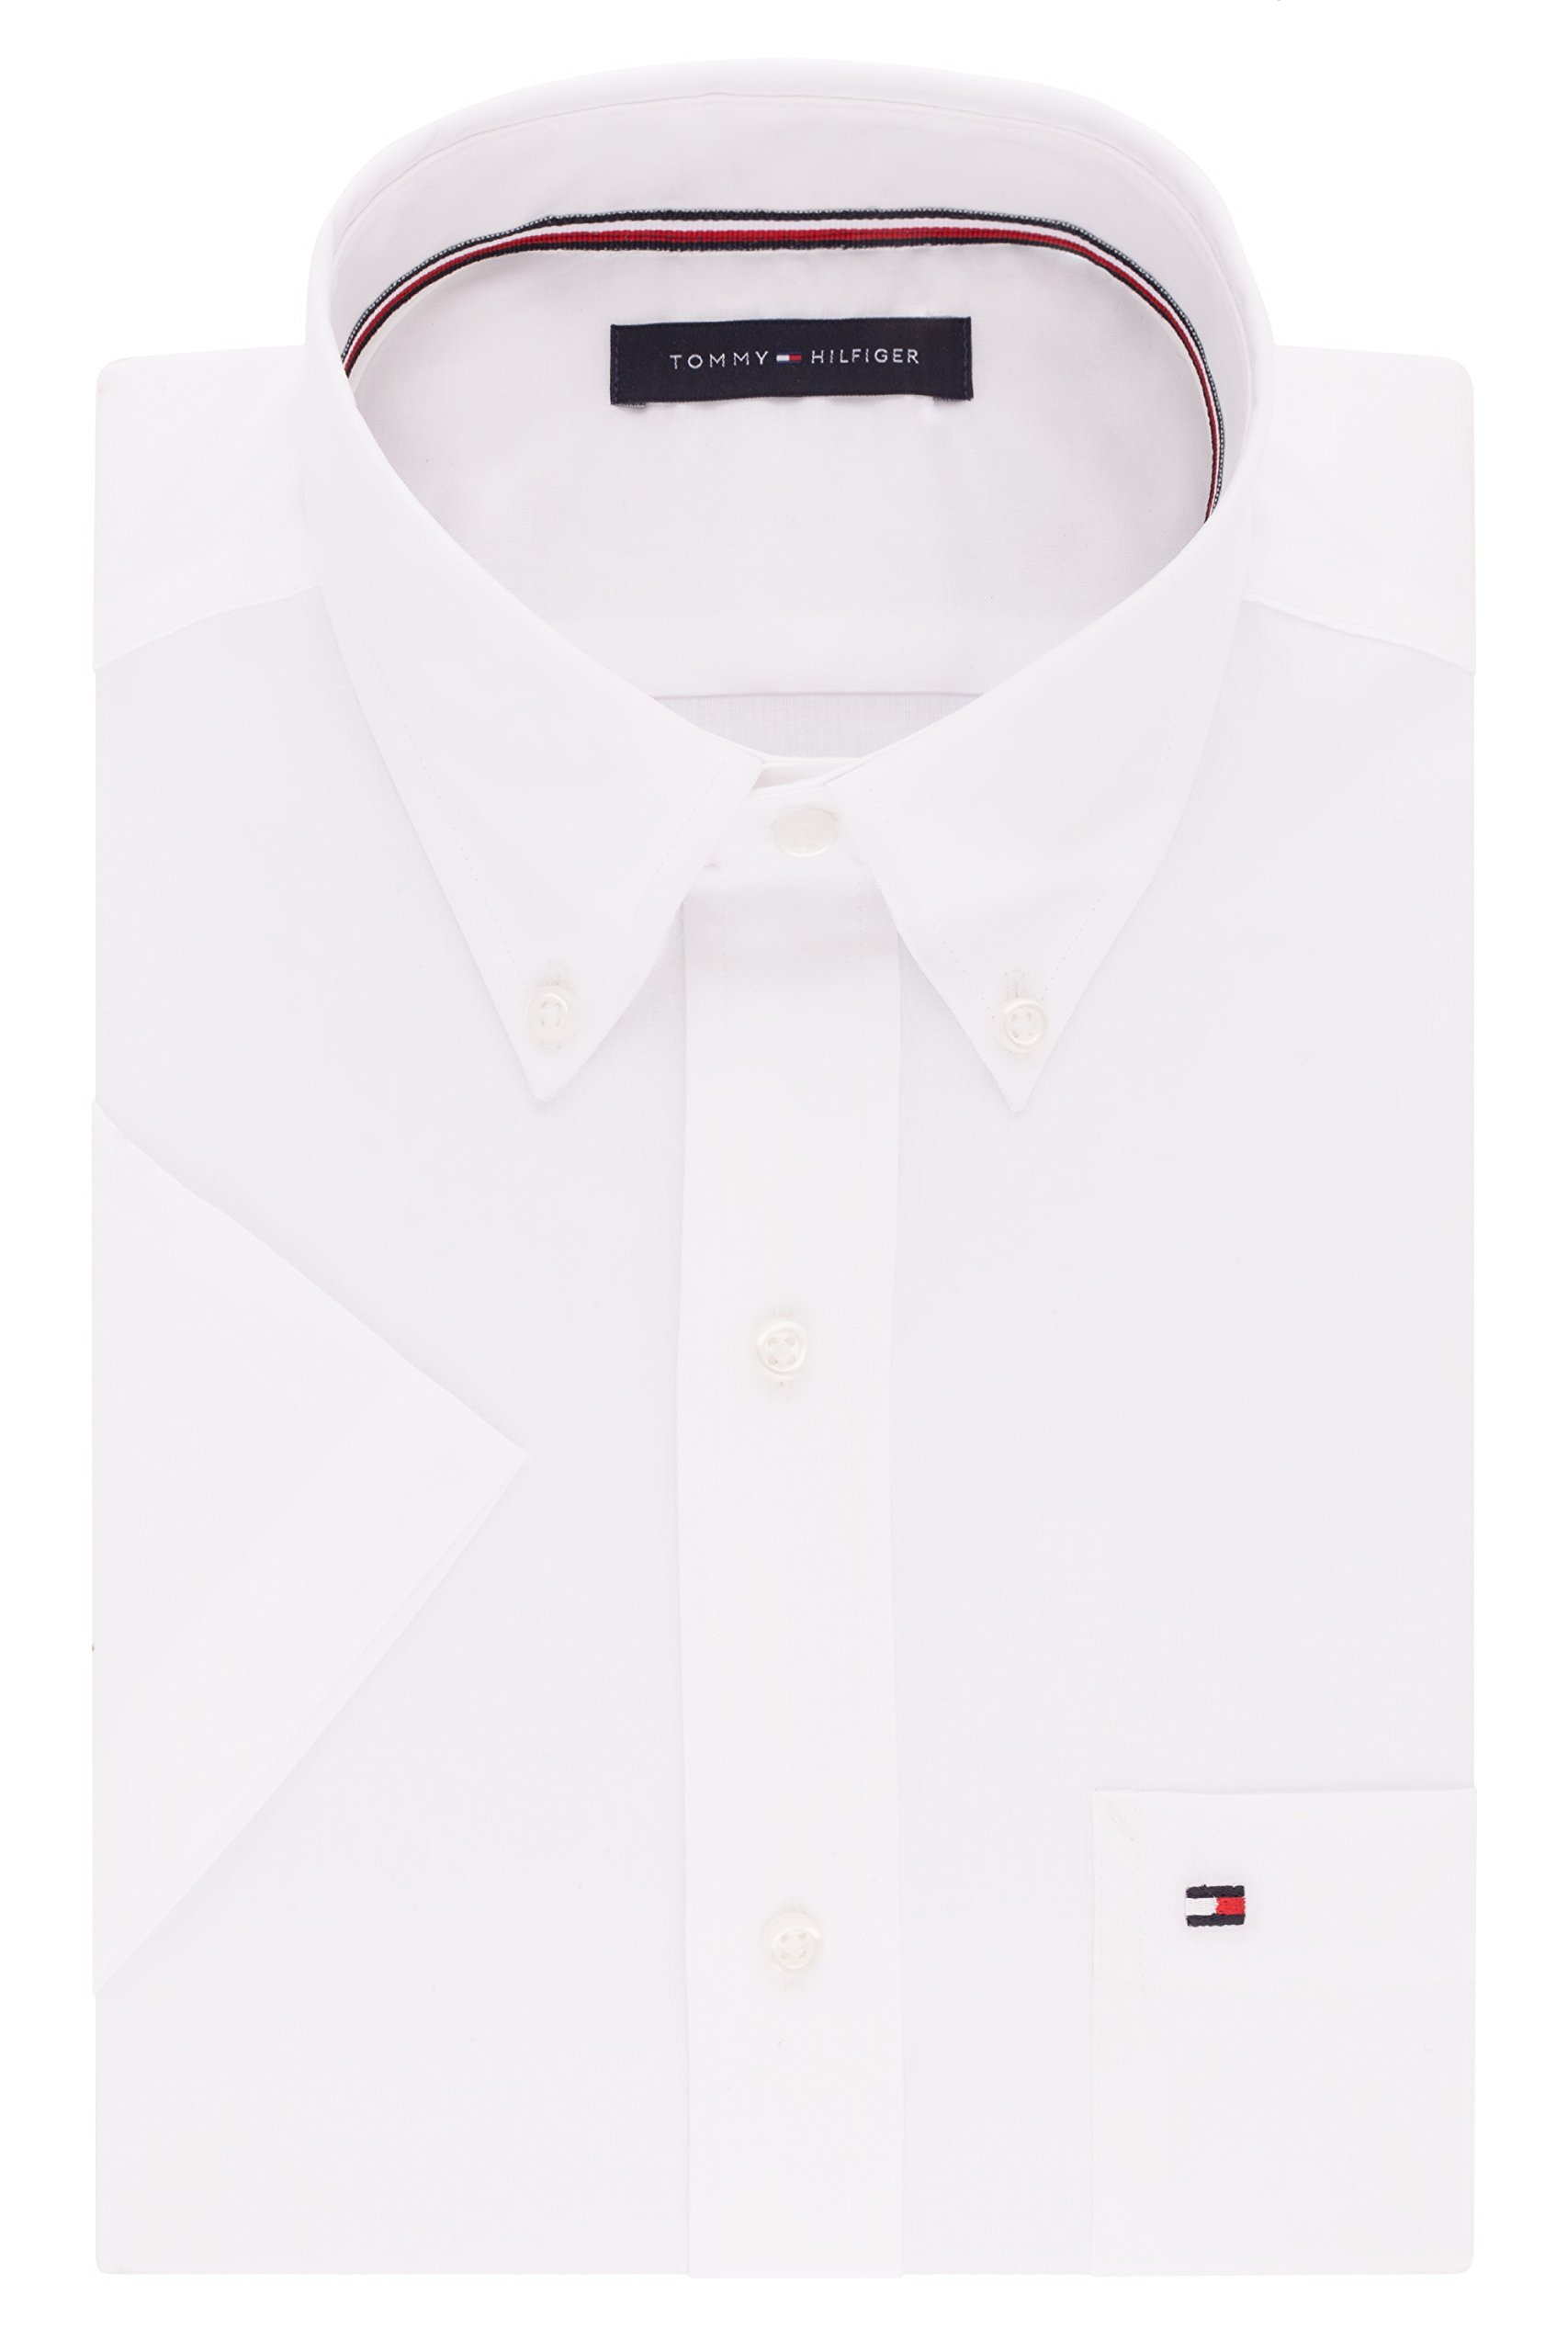 Tommy Hilfiger Men's Short Sleeve Button-Down Shirt, White, 16.5'' Neck